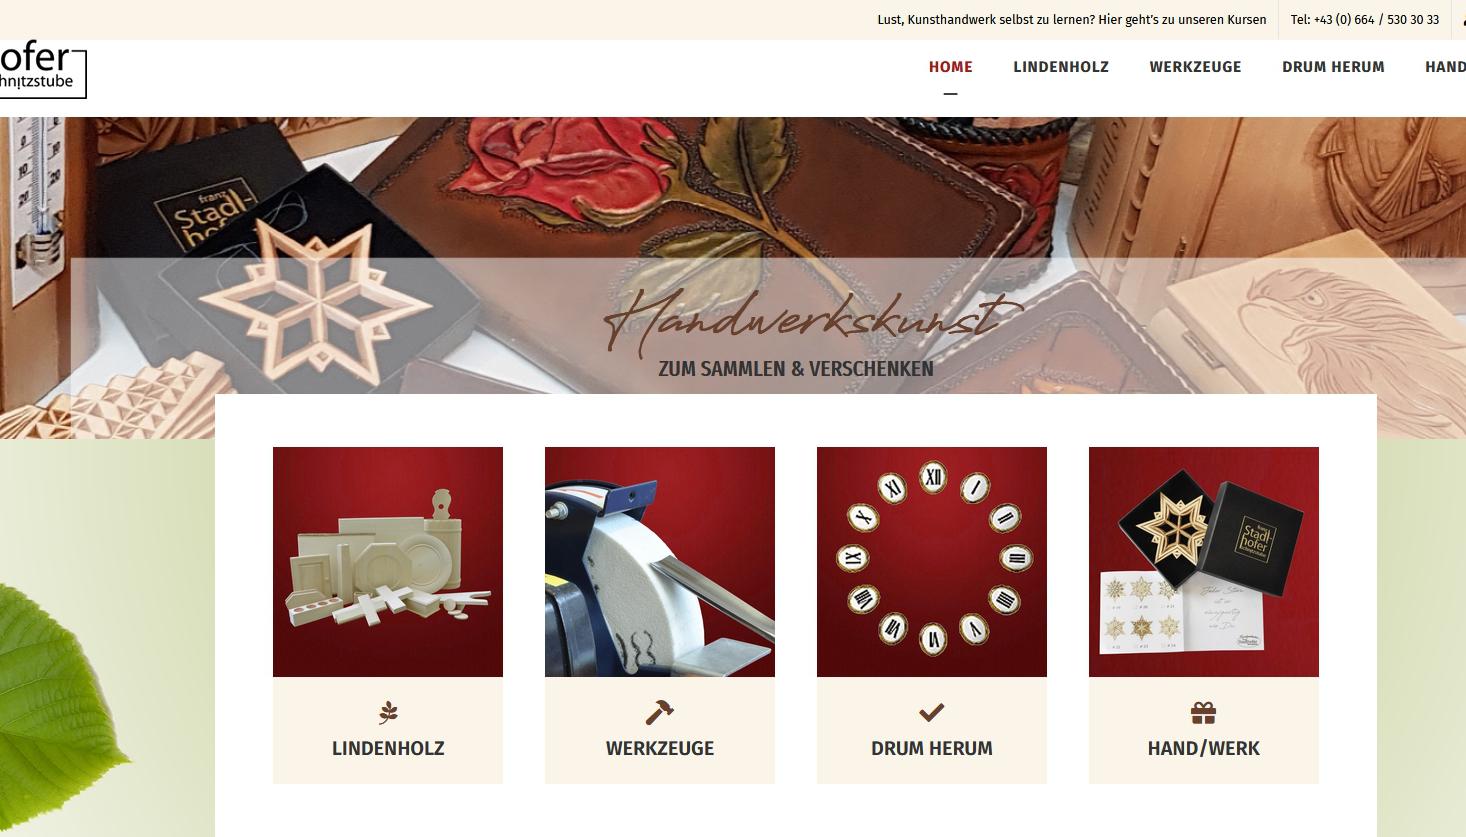 Webshop Schnitzstube Stadlhofer